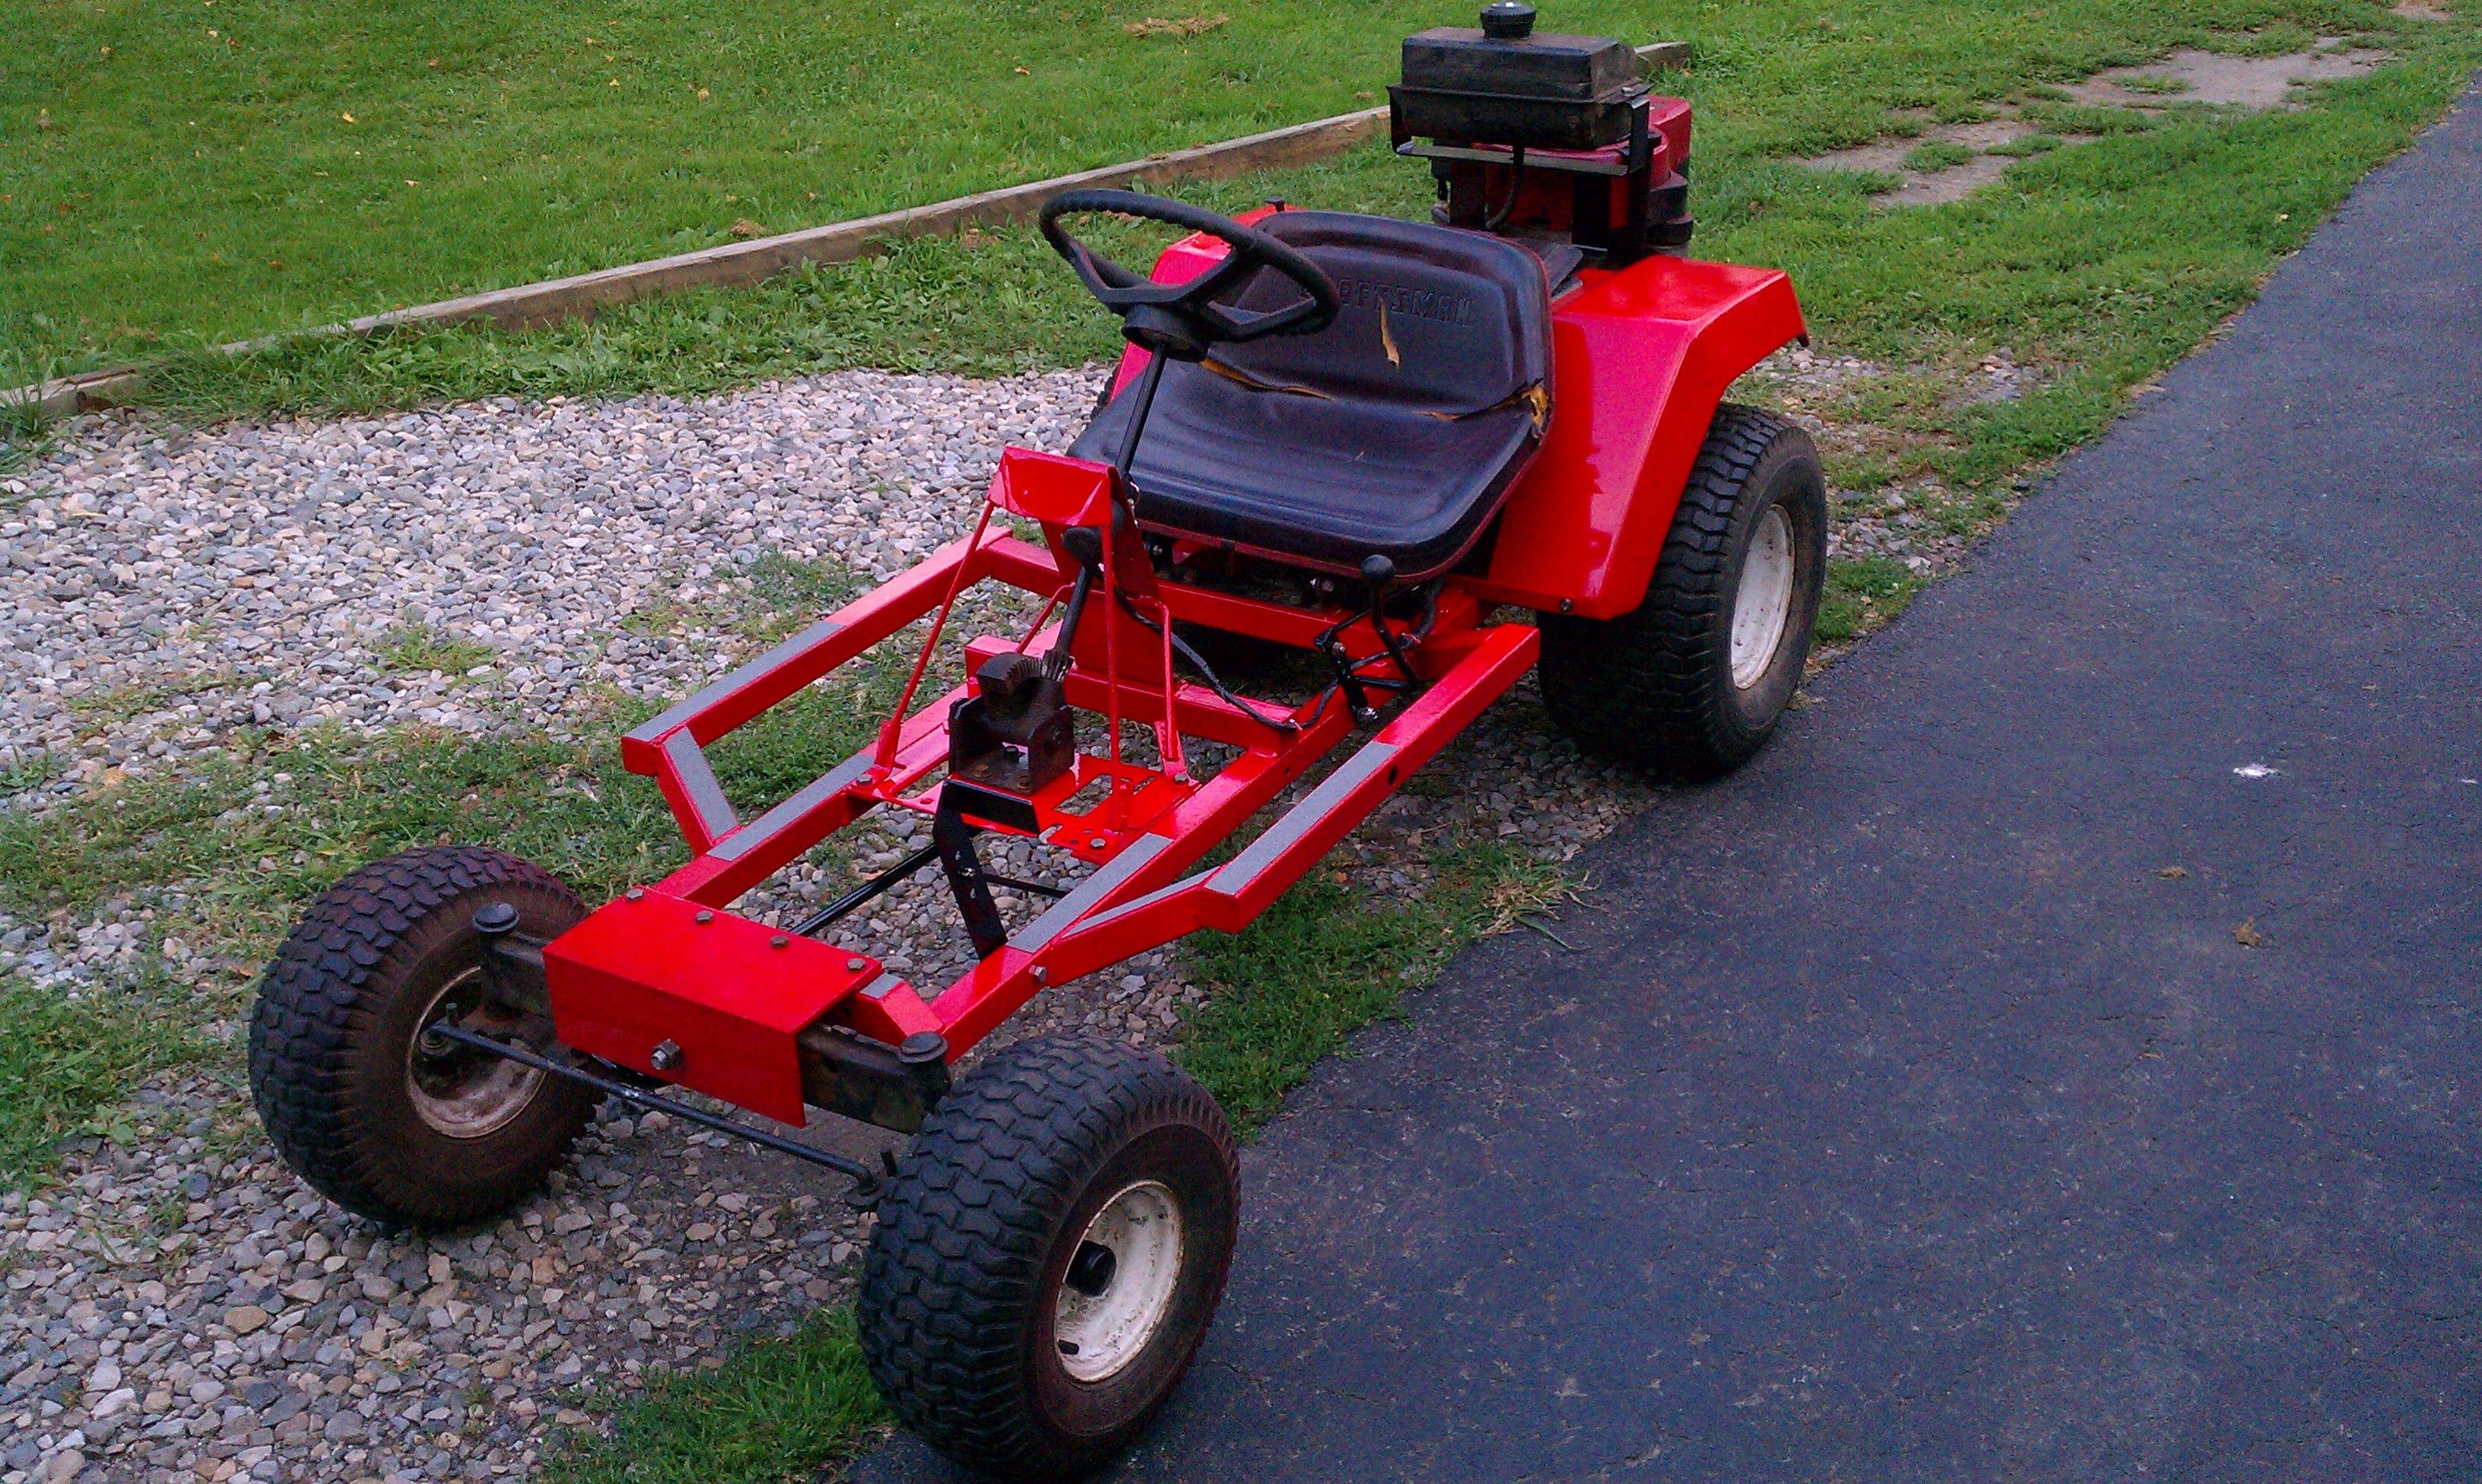 Lawn Mower Go Kart Conversion